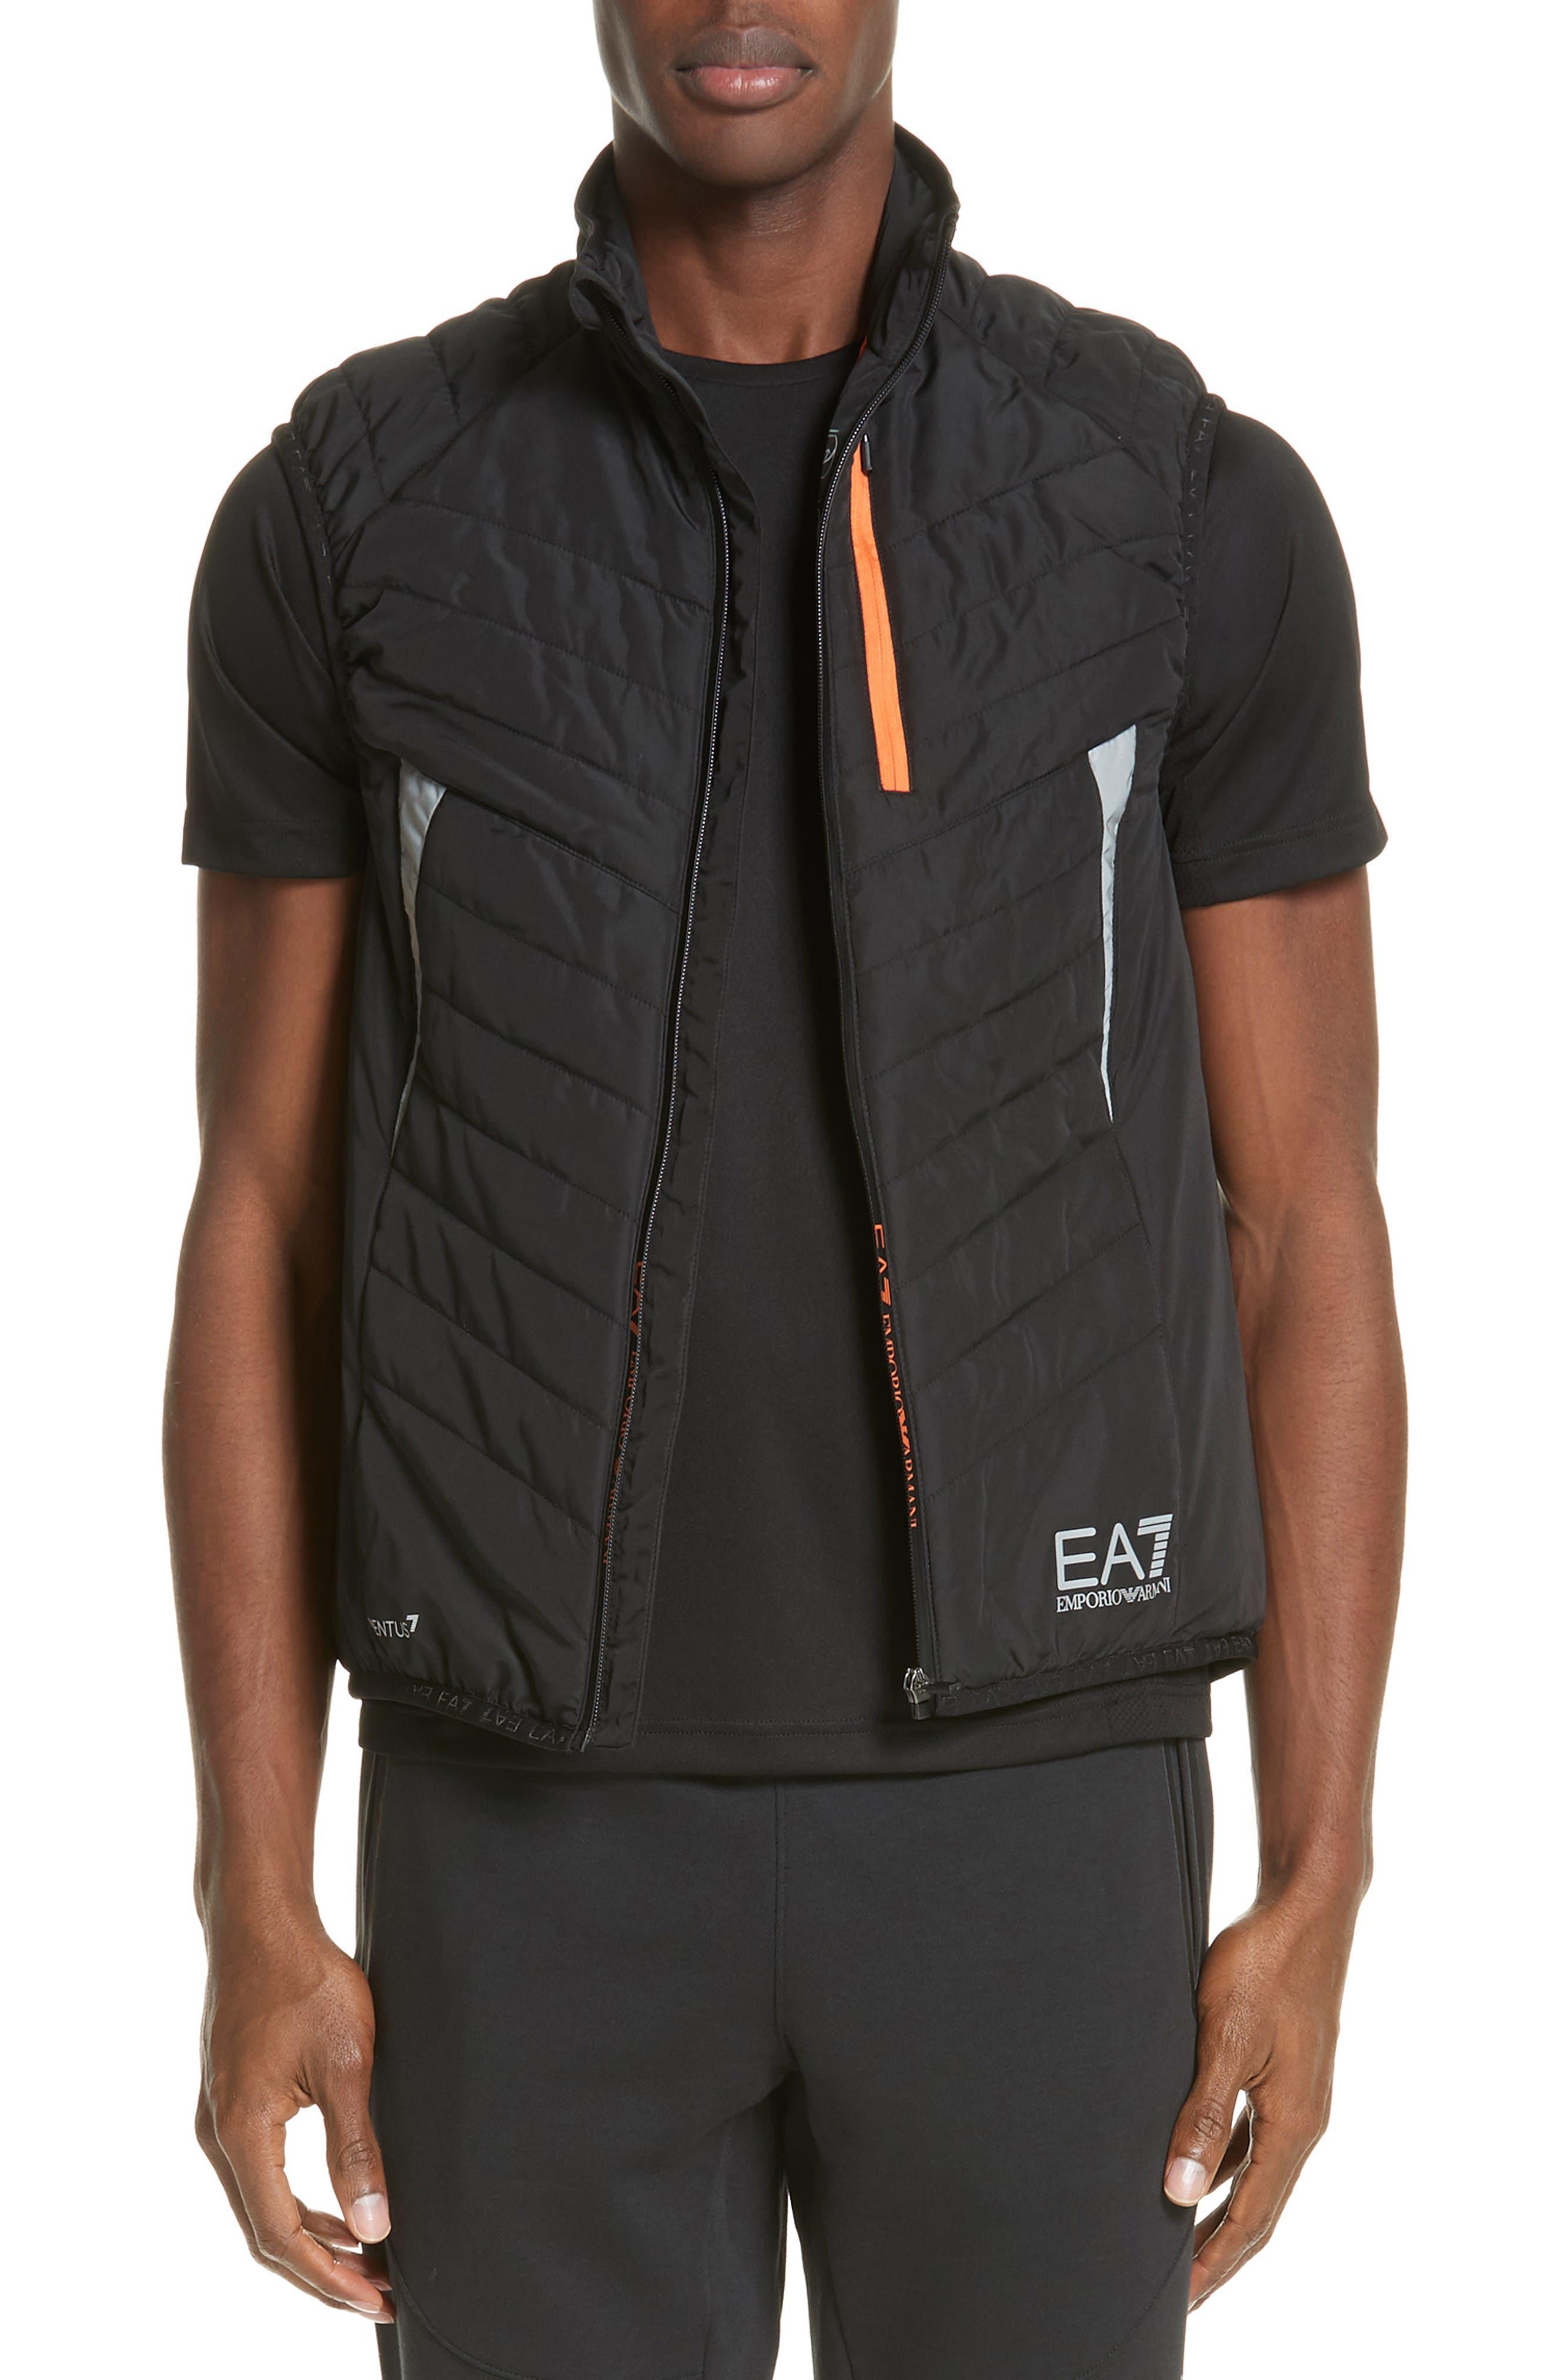 Ea7 Water Resistant Vest, Black